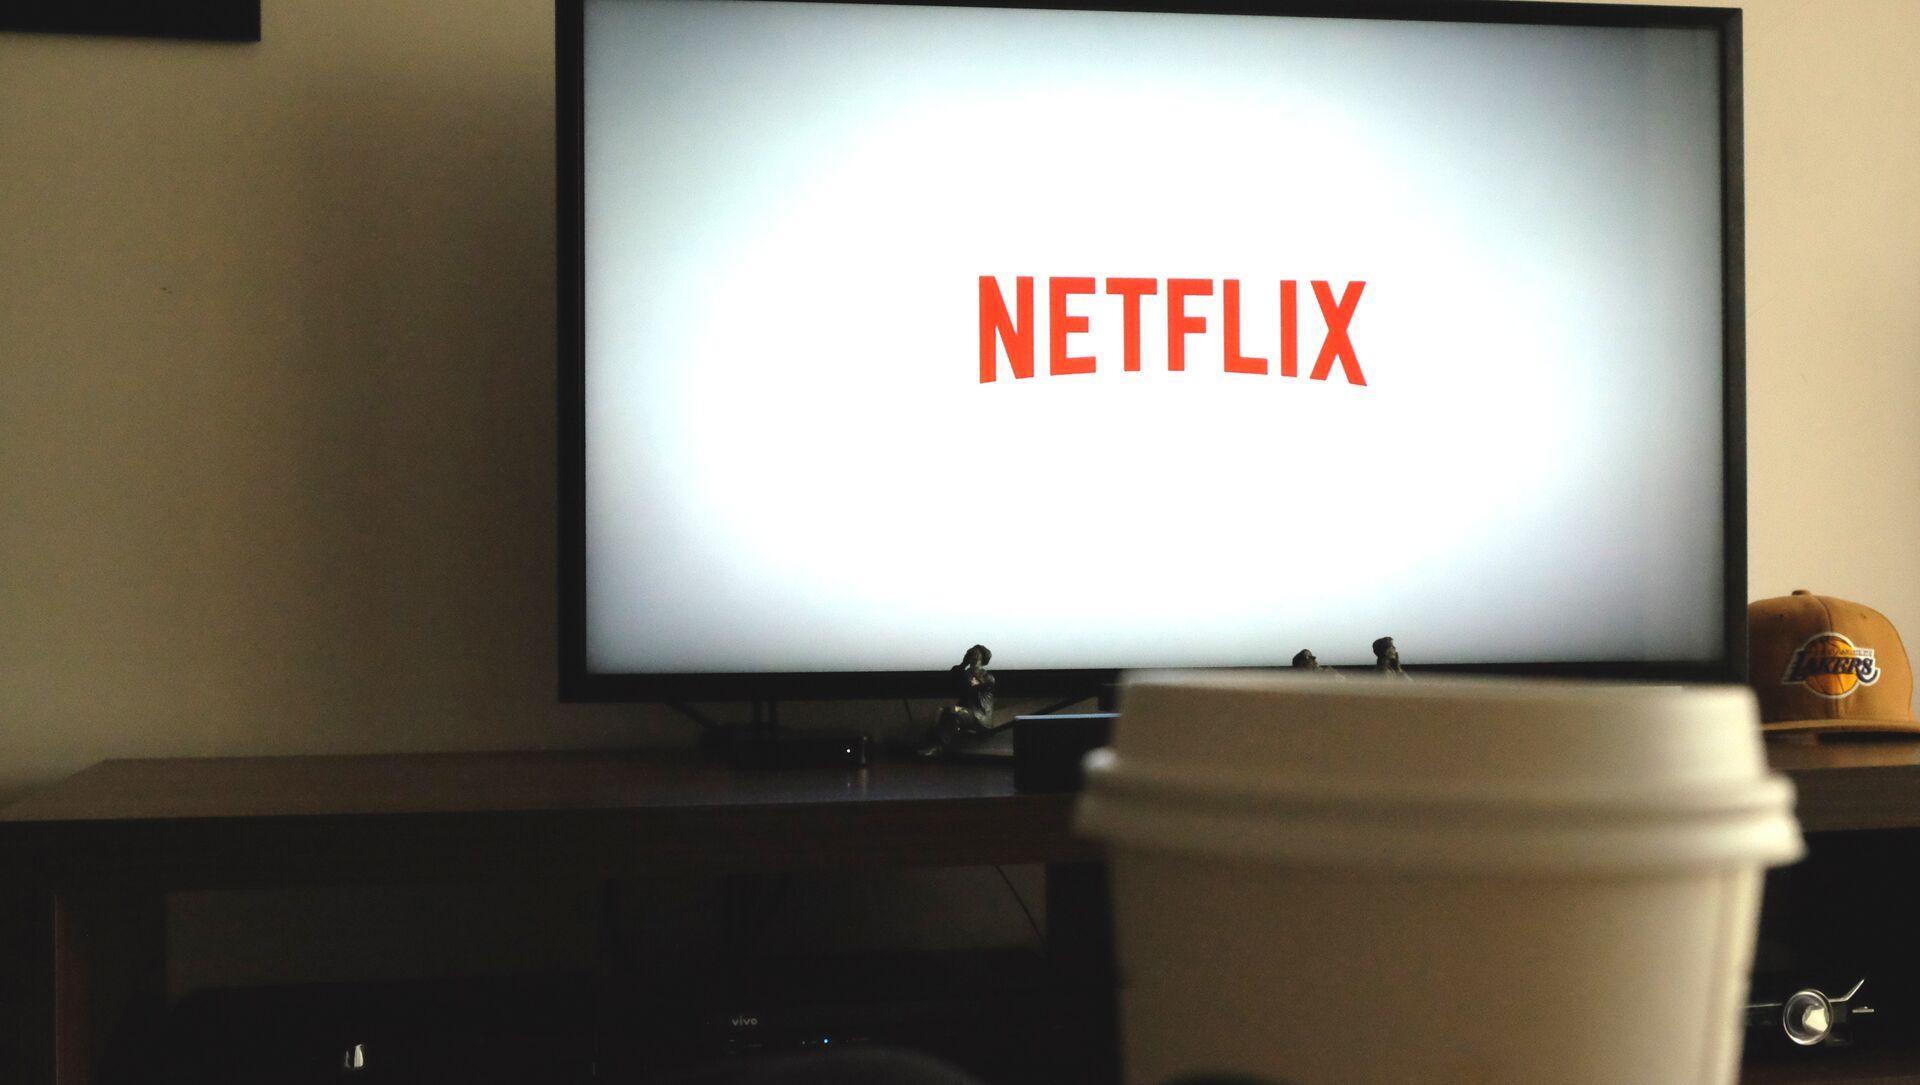 Netflix - Sputnik Mundo, 1920, 25.06.2019